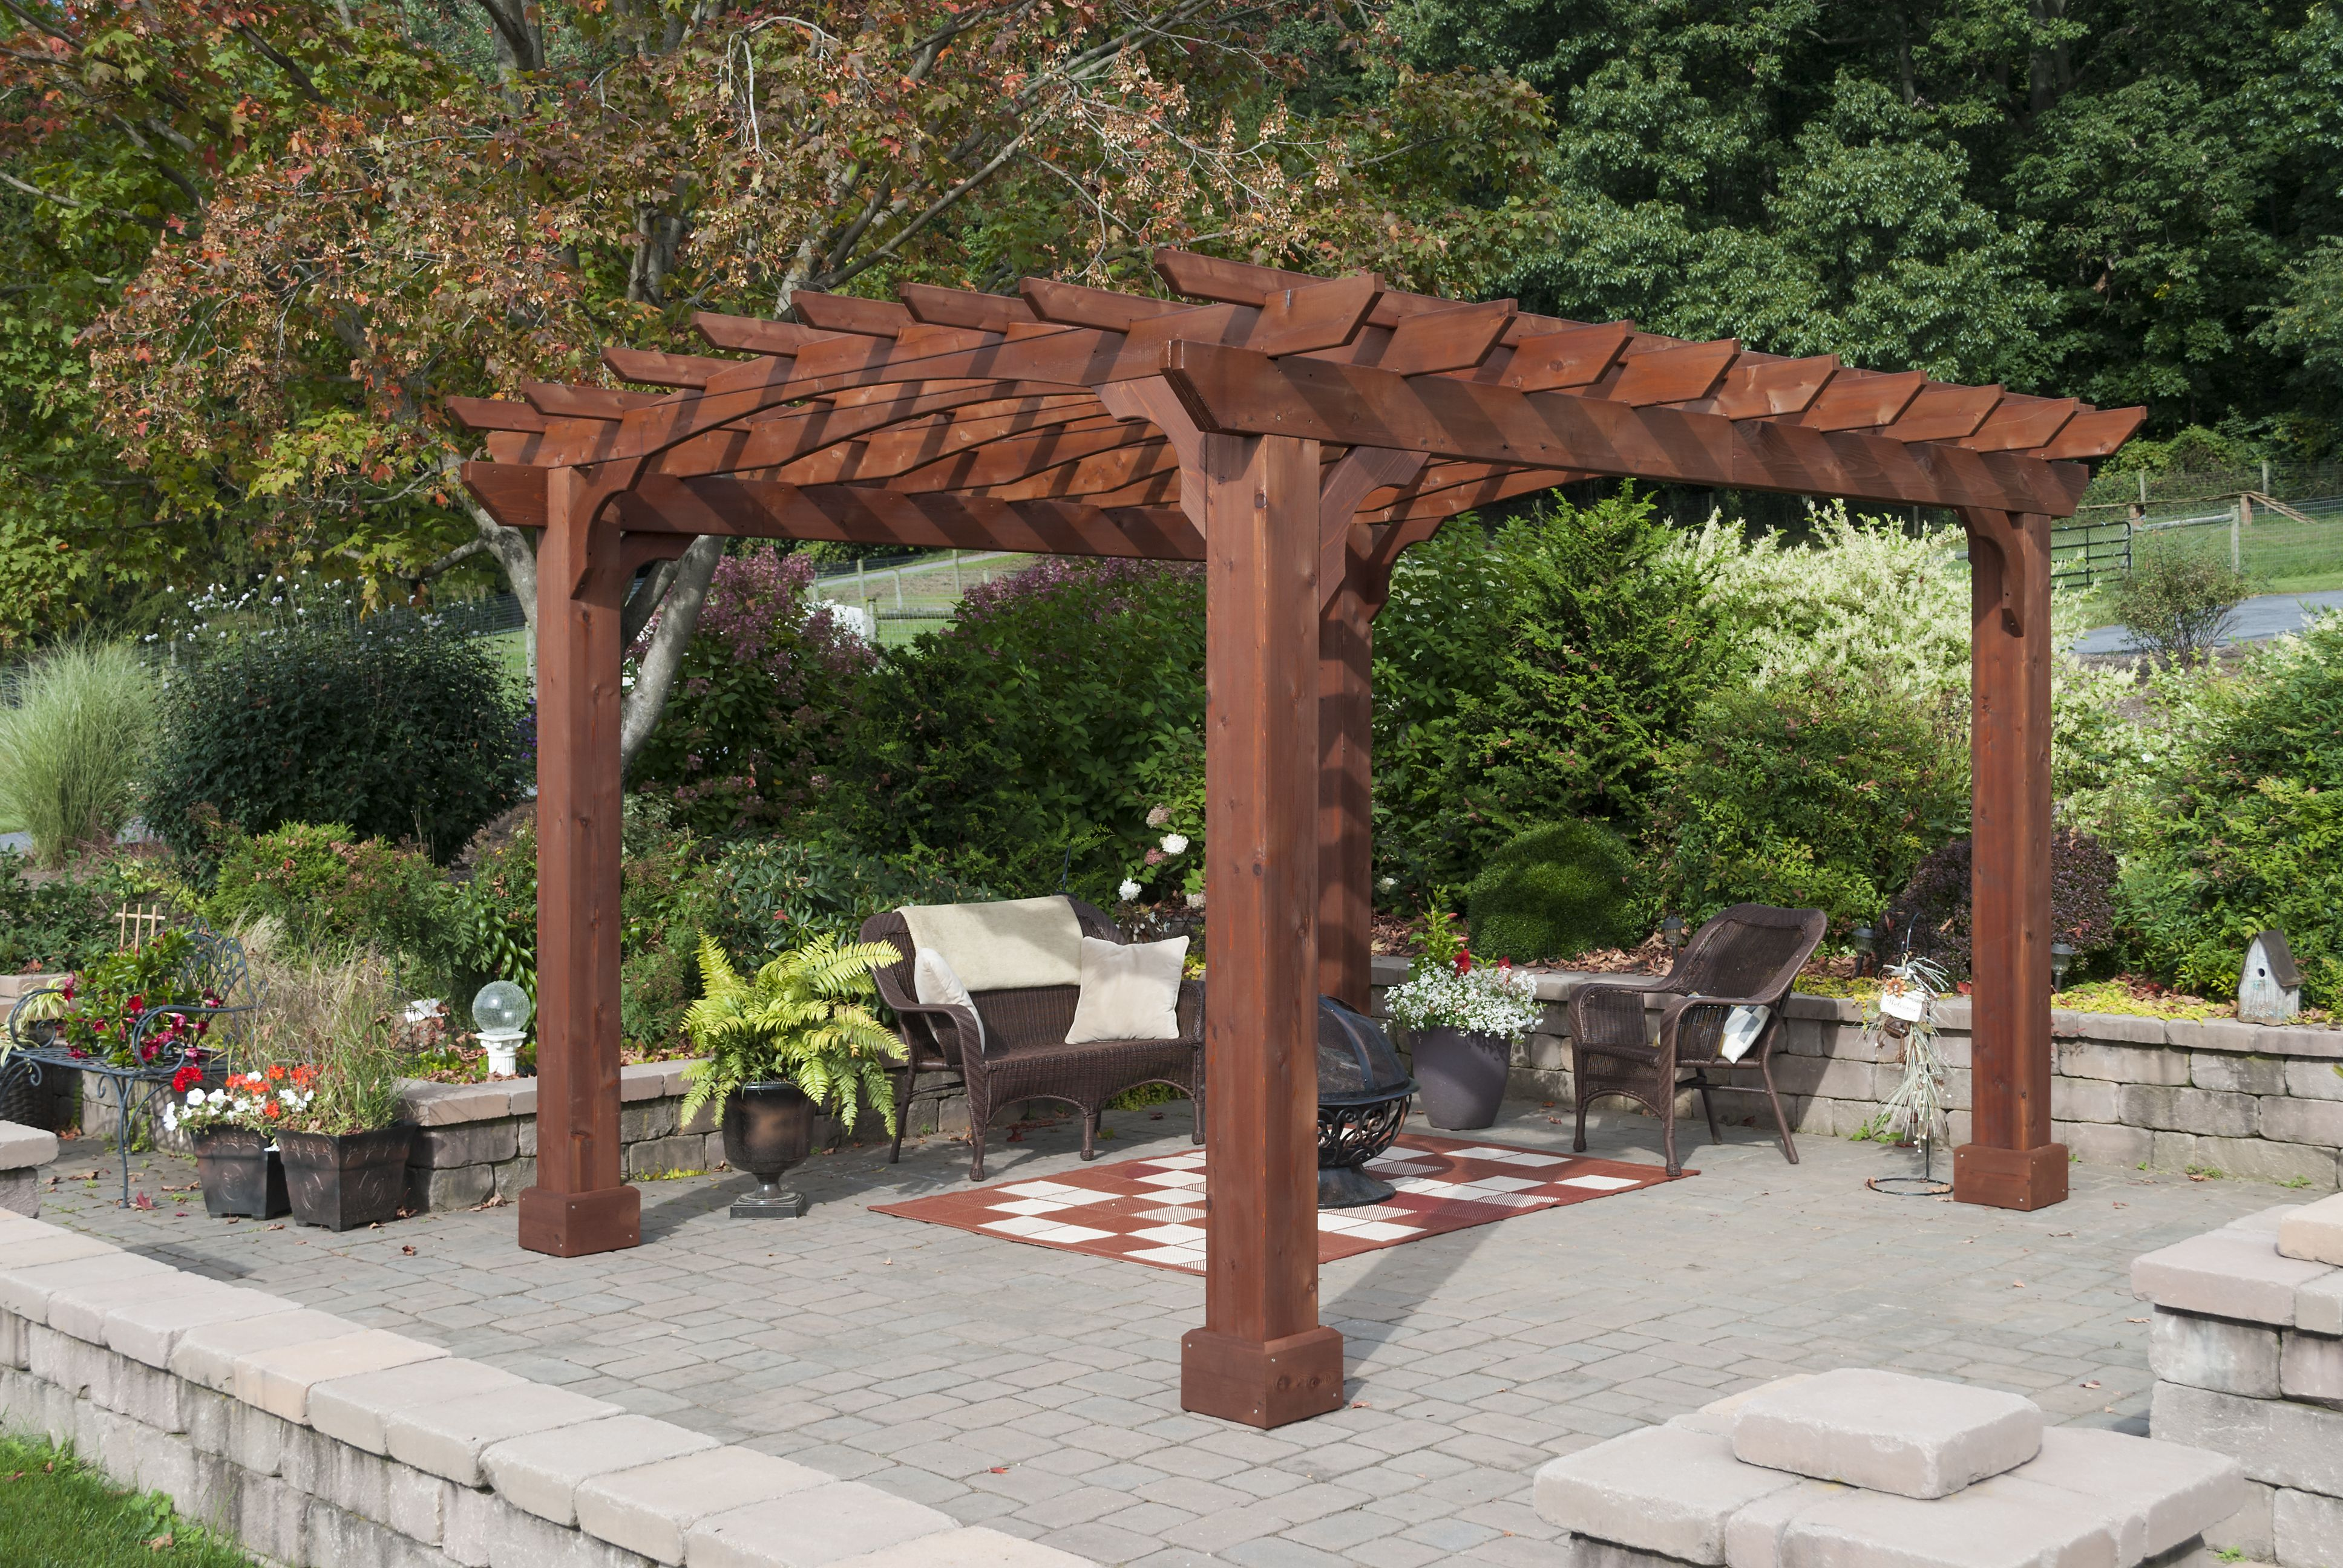 10x12 Wood Pergola Kit Canyon Brown Yardcraft Wood Pergola Wood Pergola Kits Pergola Designs